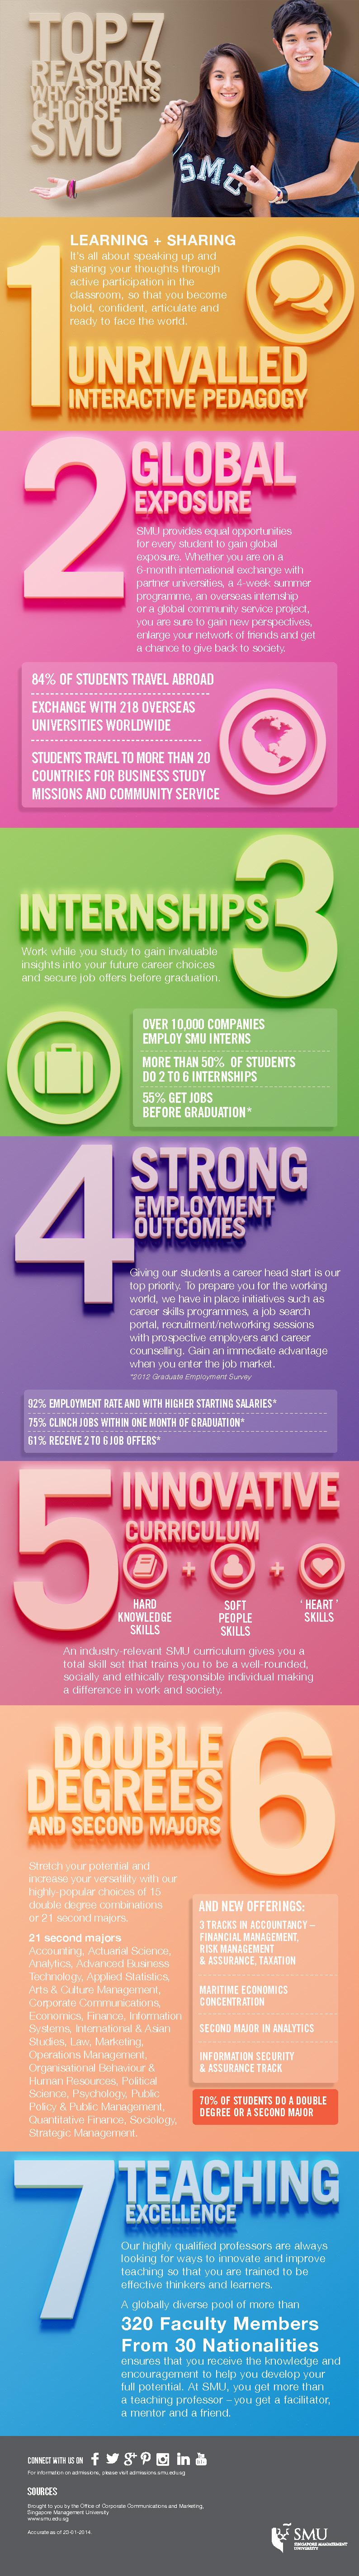 Smu Infographics Top 7 Reasons Why Students Choose Smu Singapore Management University Smu Smu Infographic Pedagogy